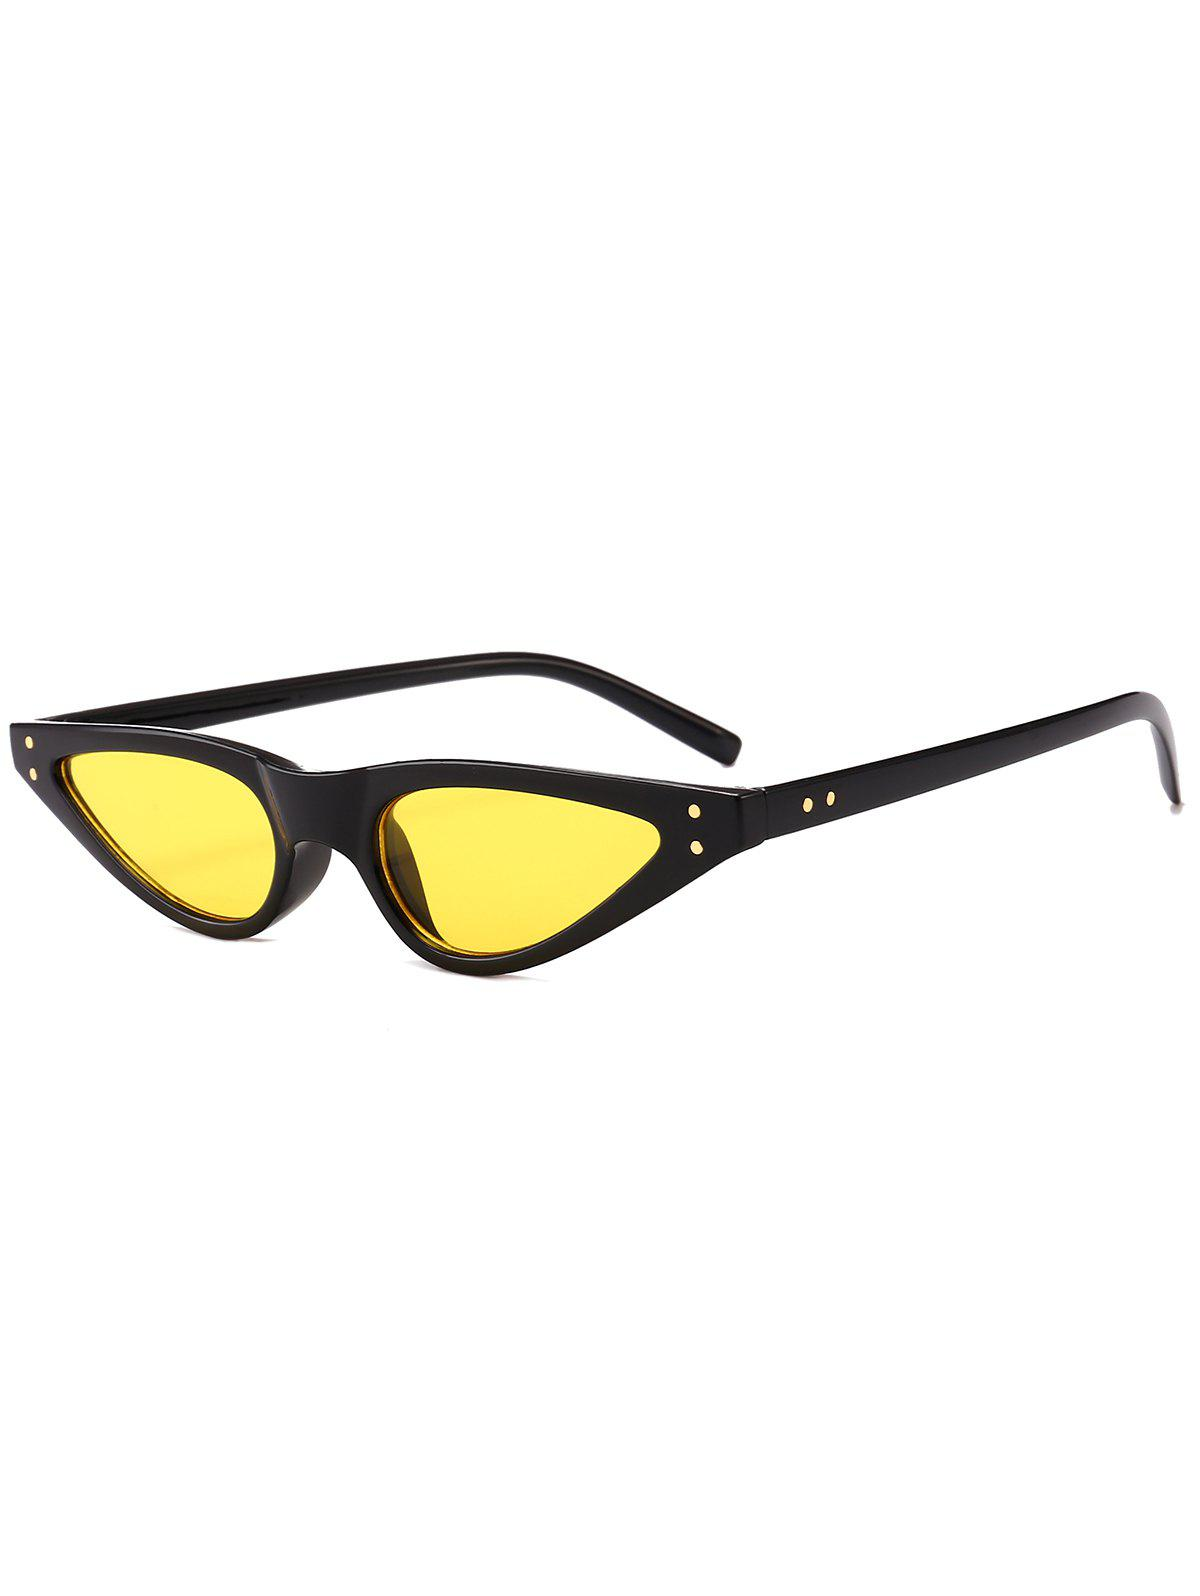 Anti-fatigue Full Frame Sun Shades Sunglasses